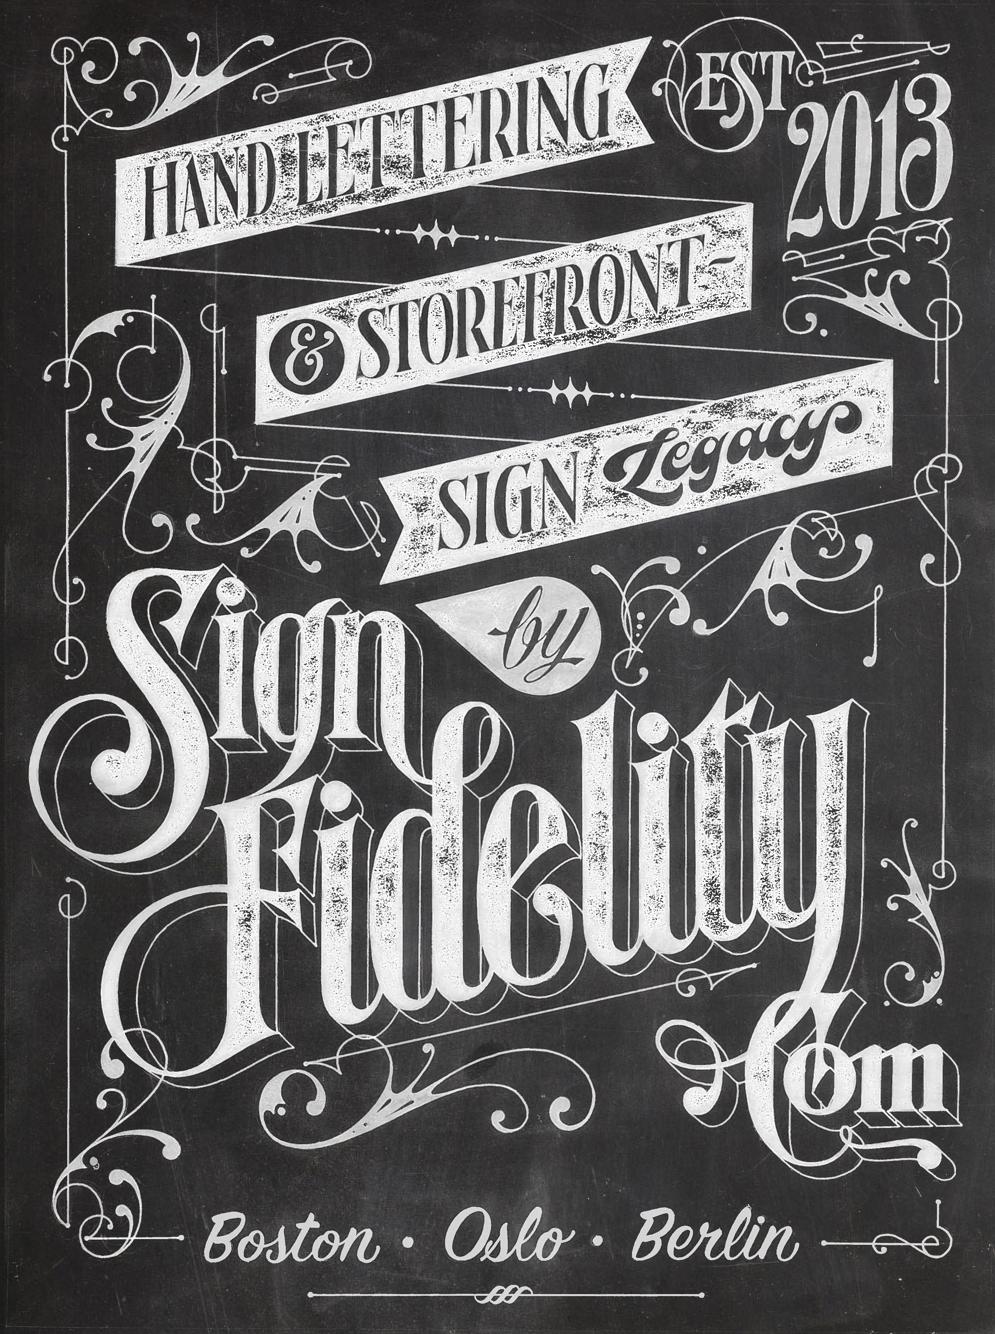 Signfidelity_blackboard.png